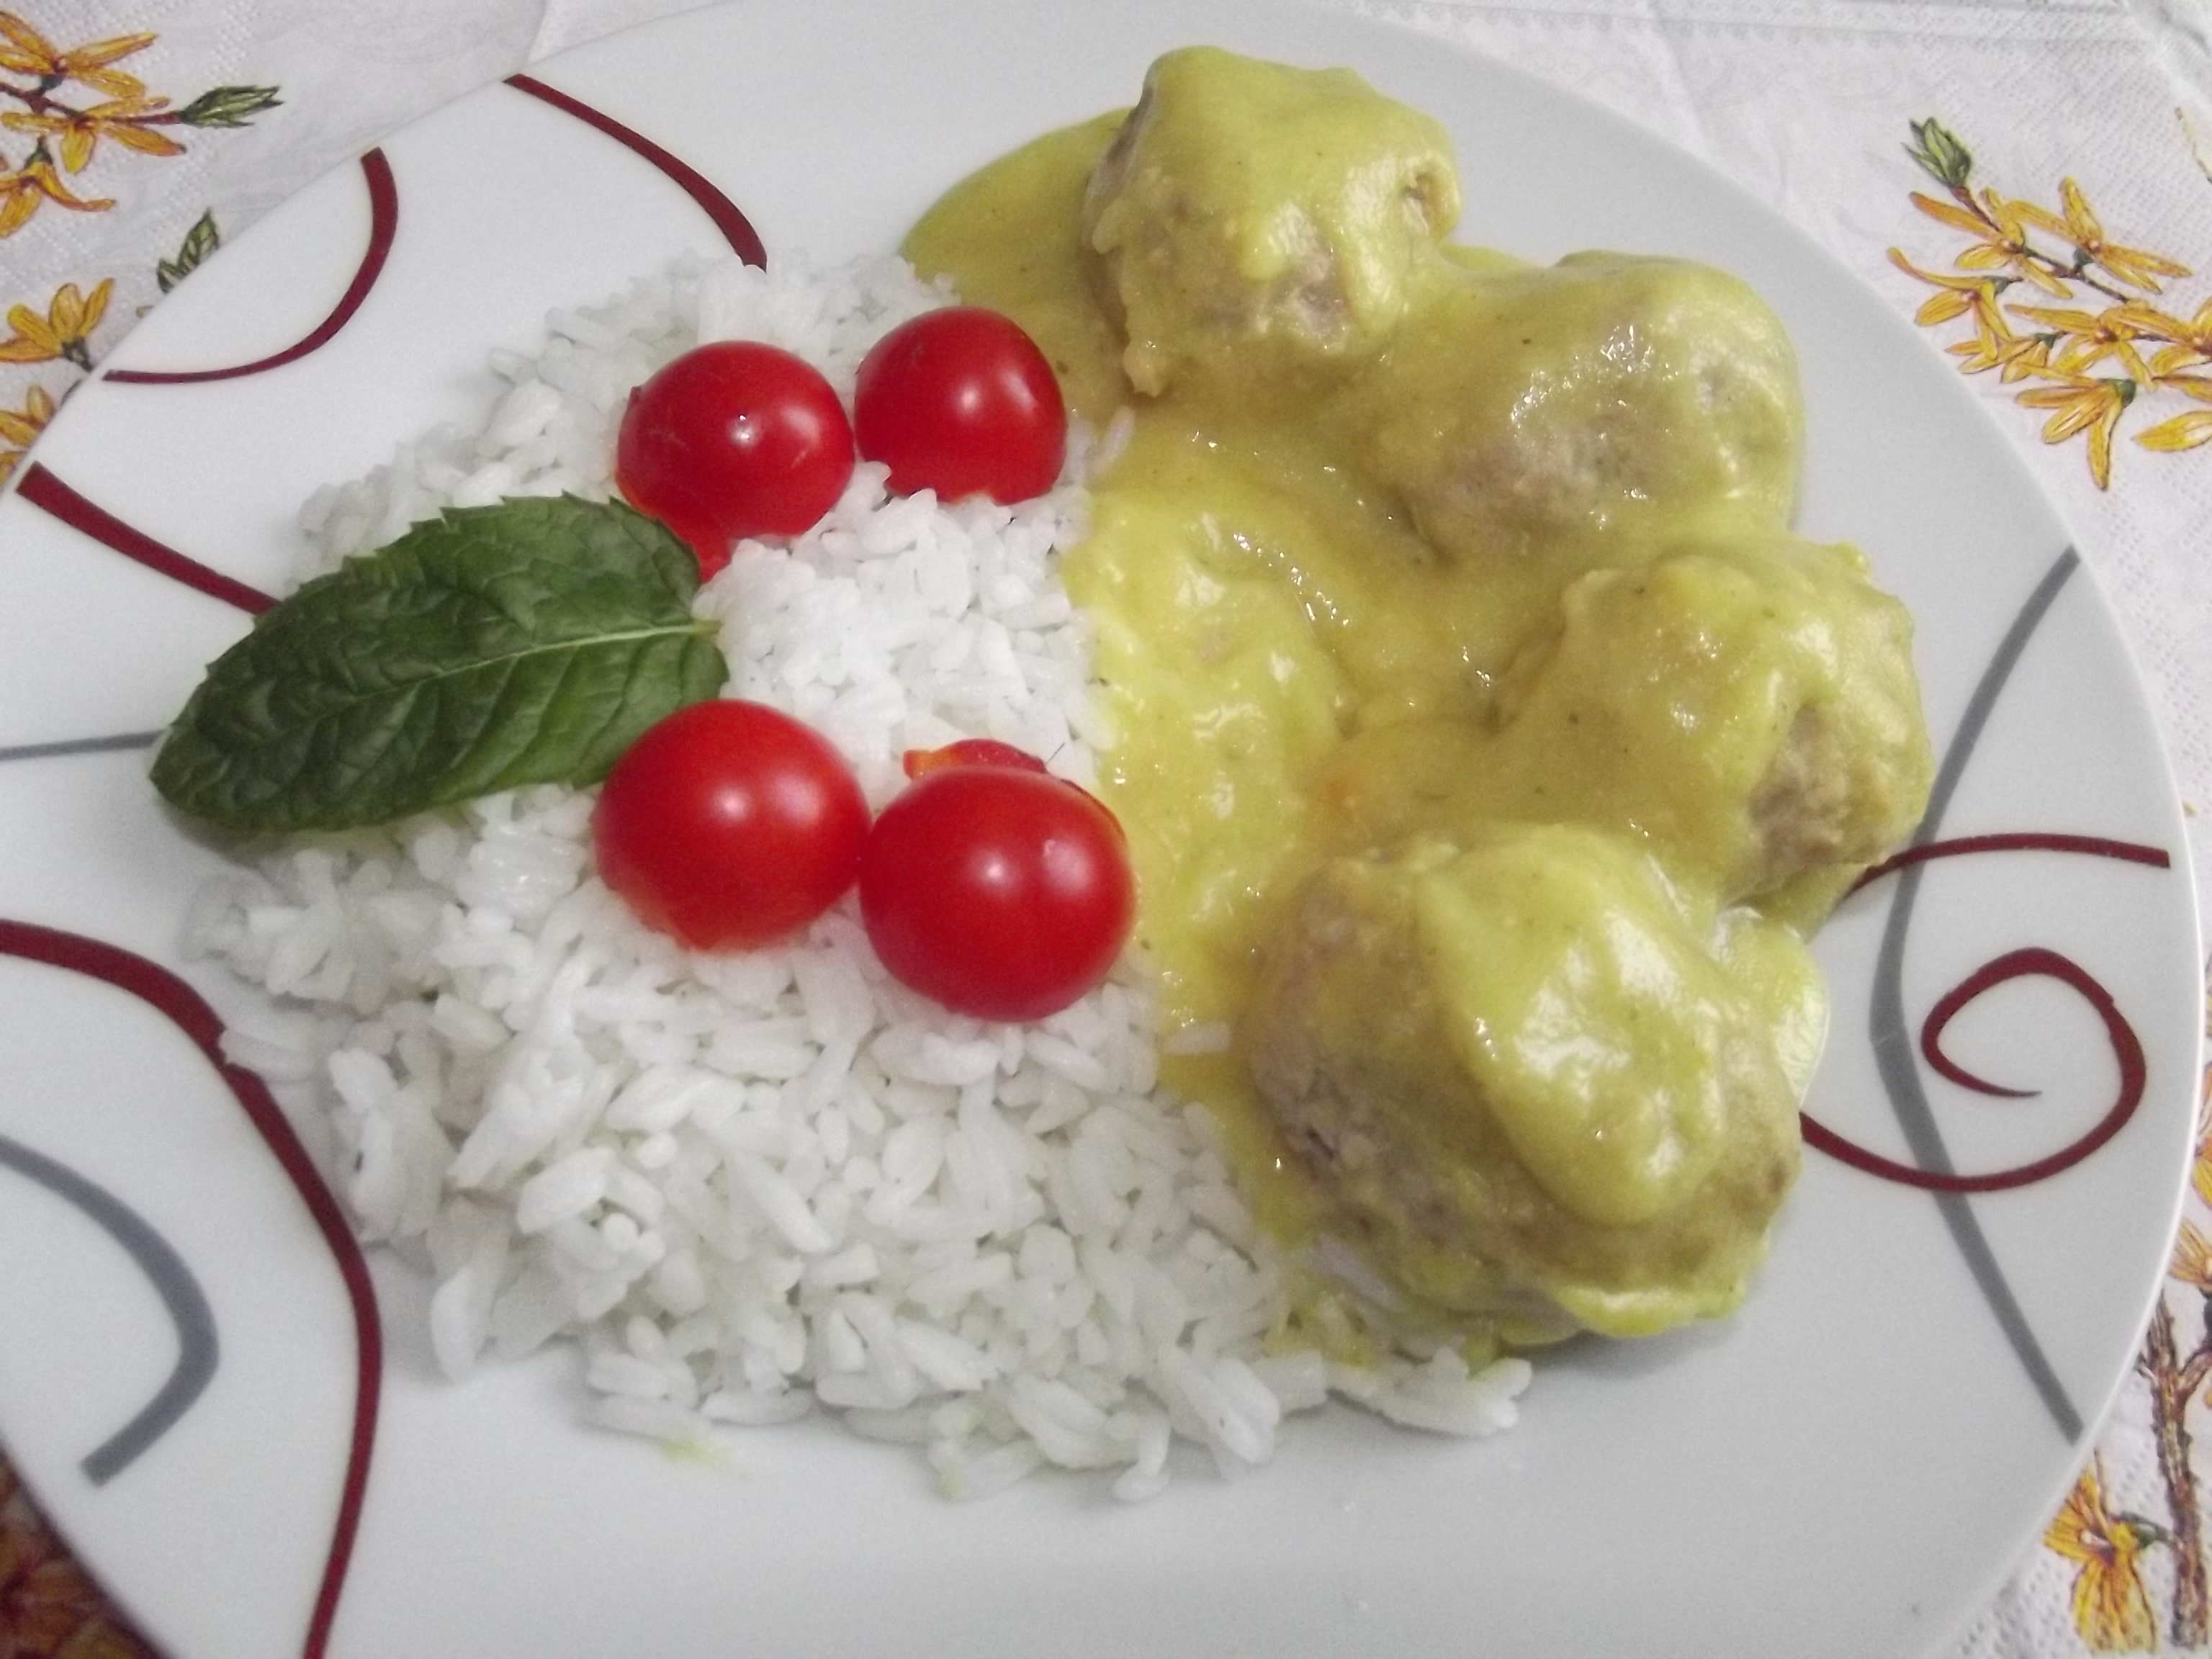 dan_husgolyok_currys_martassal.JPG